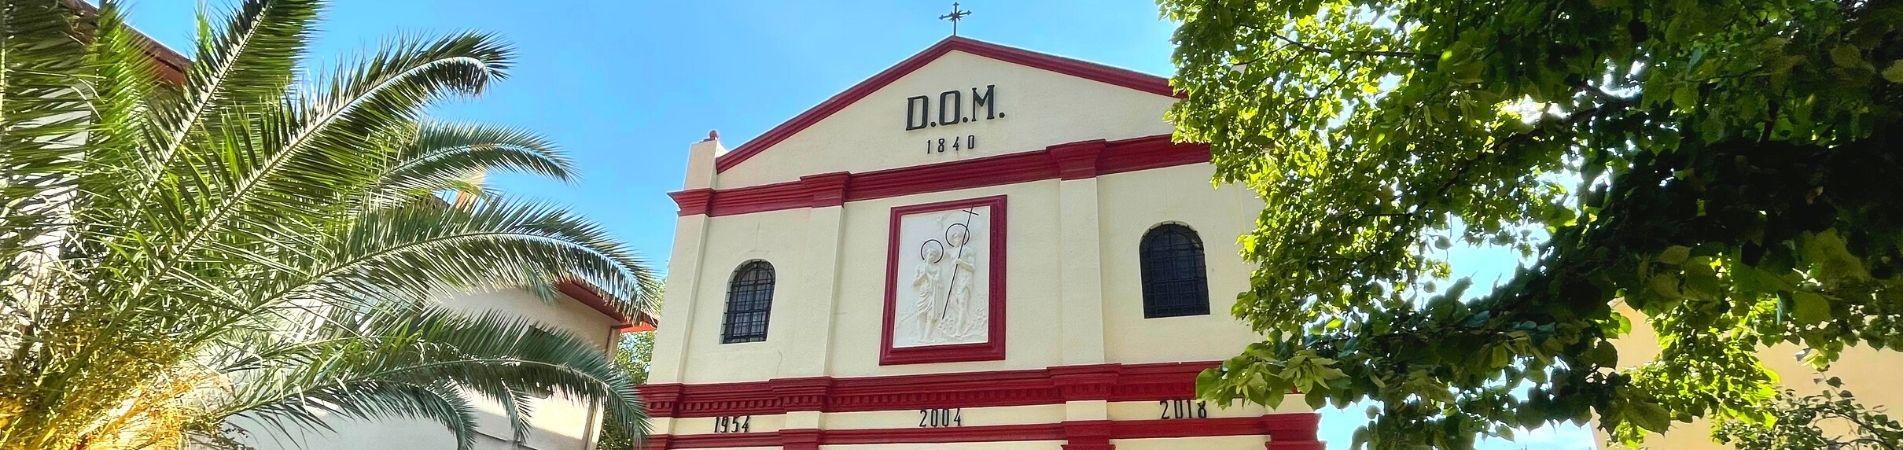 St. Baptist Latin Kilisesi (DOM), Buca